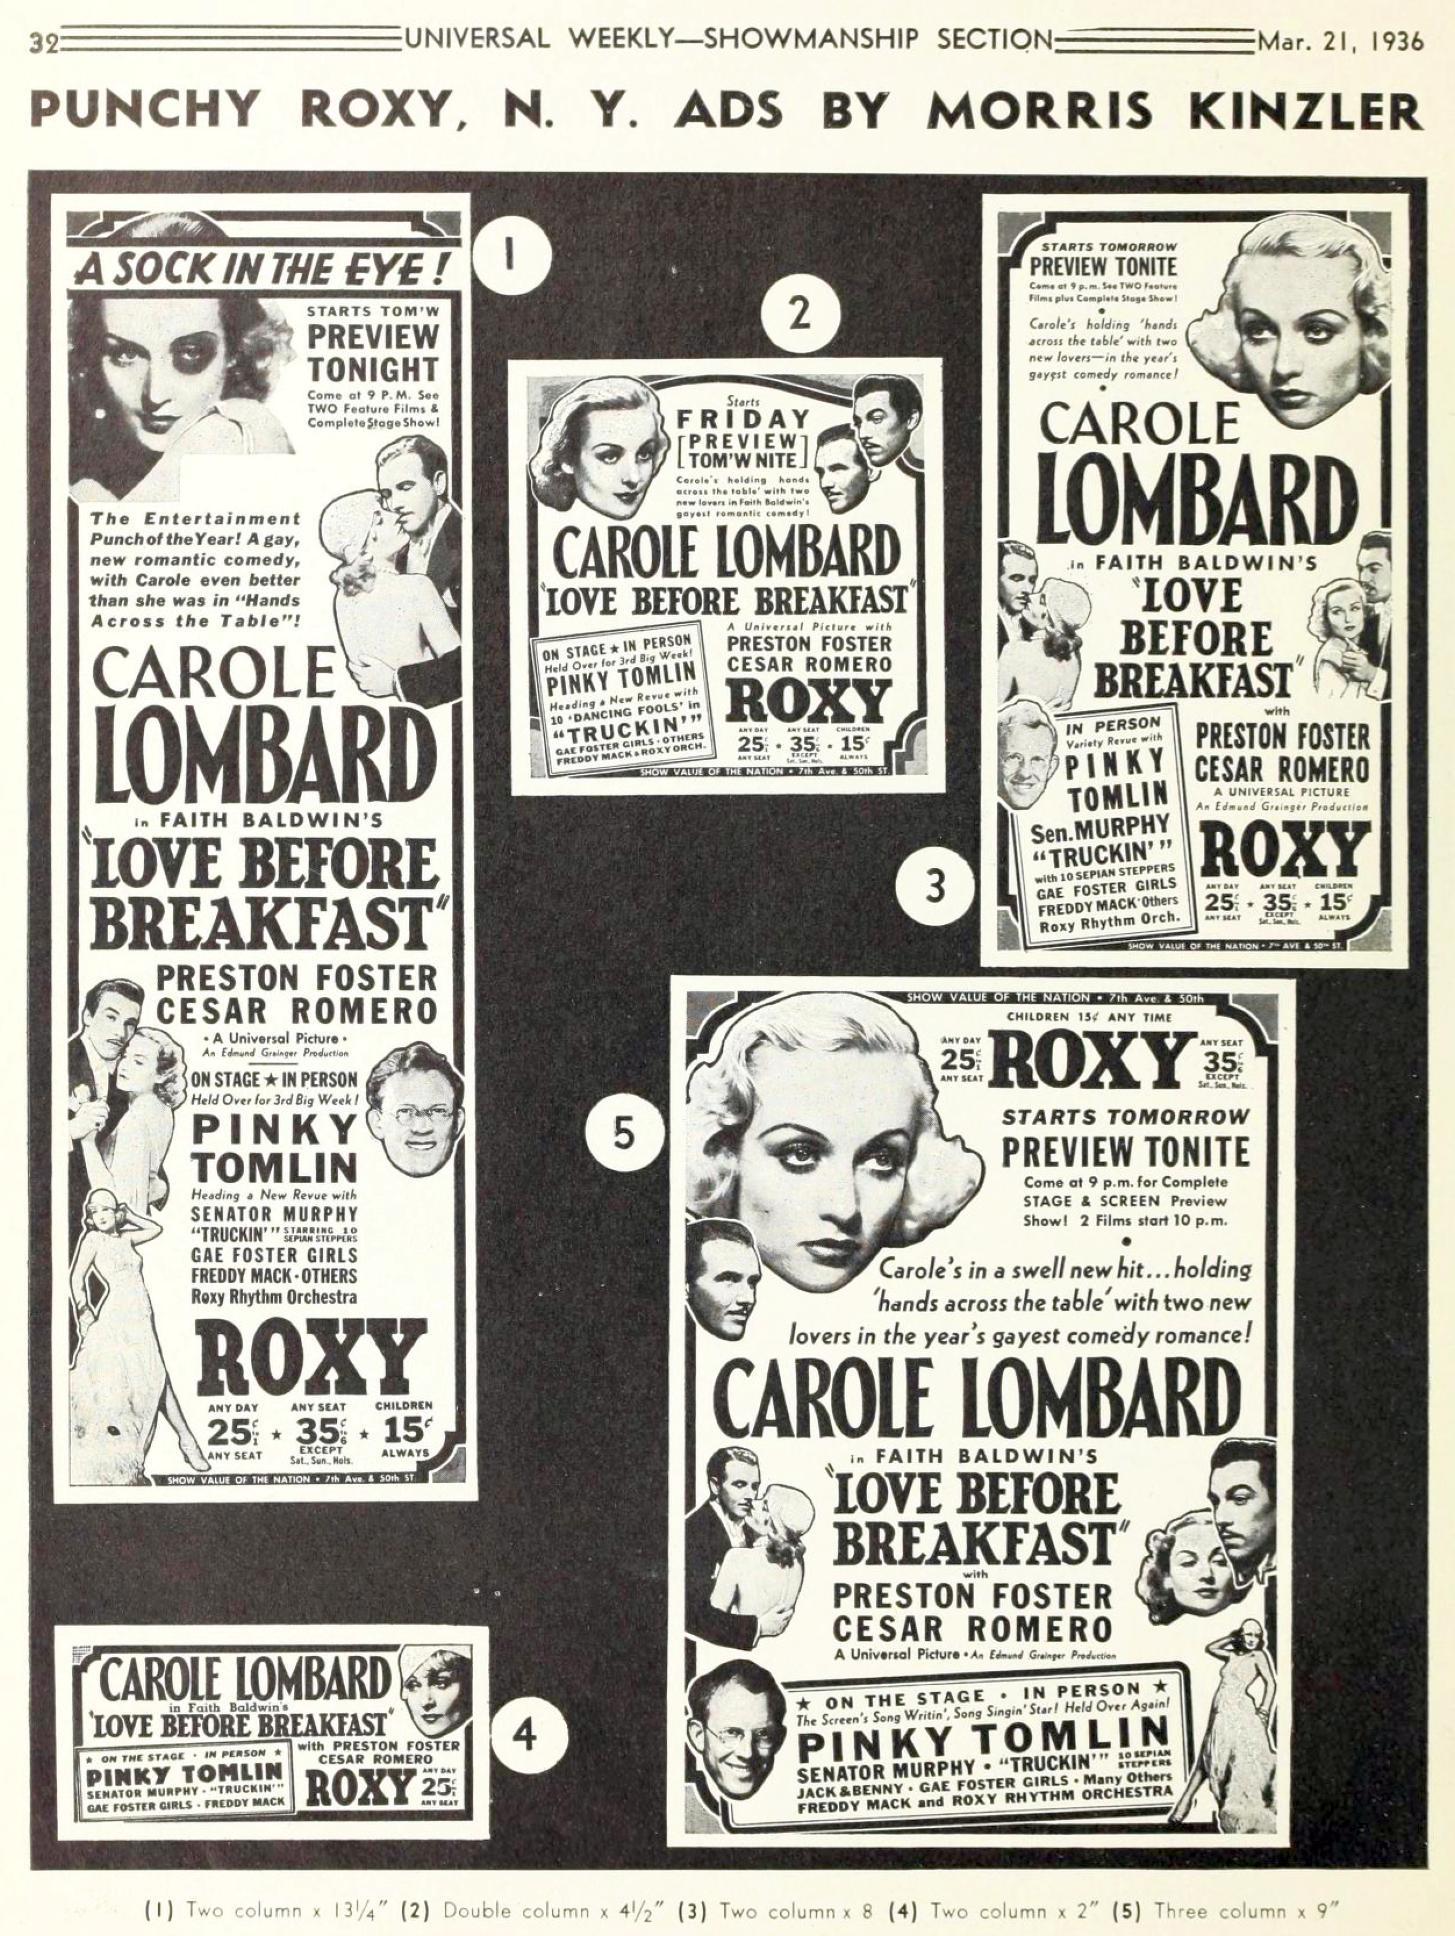 carole lombard universal weekly 032136ca